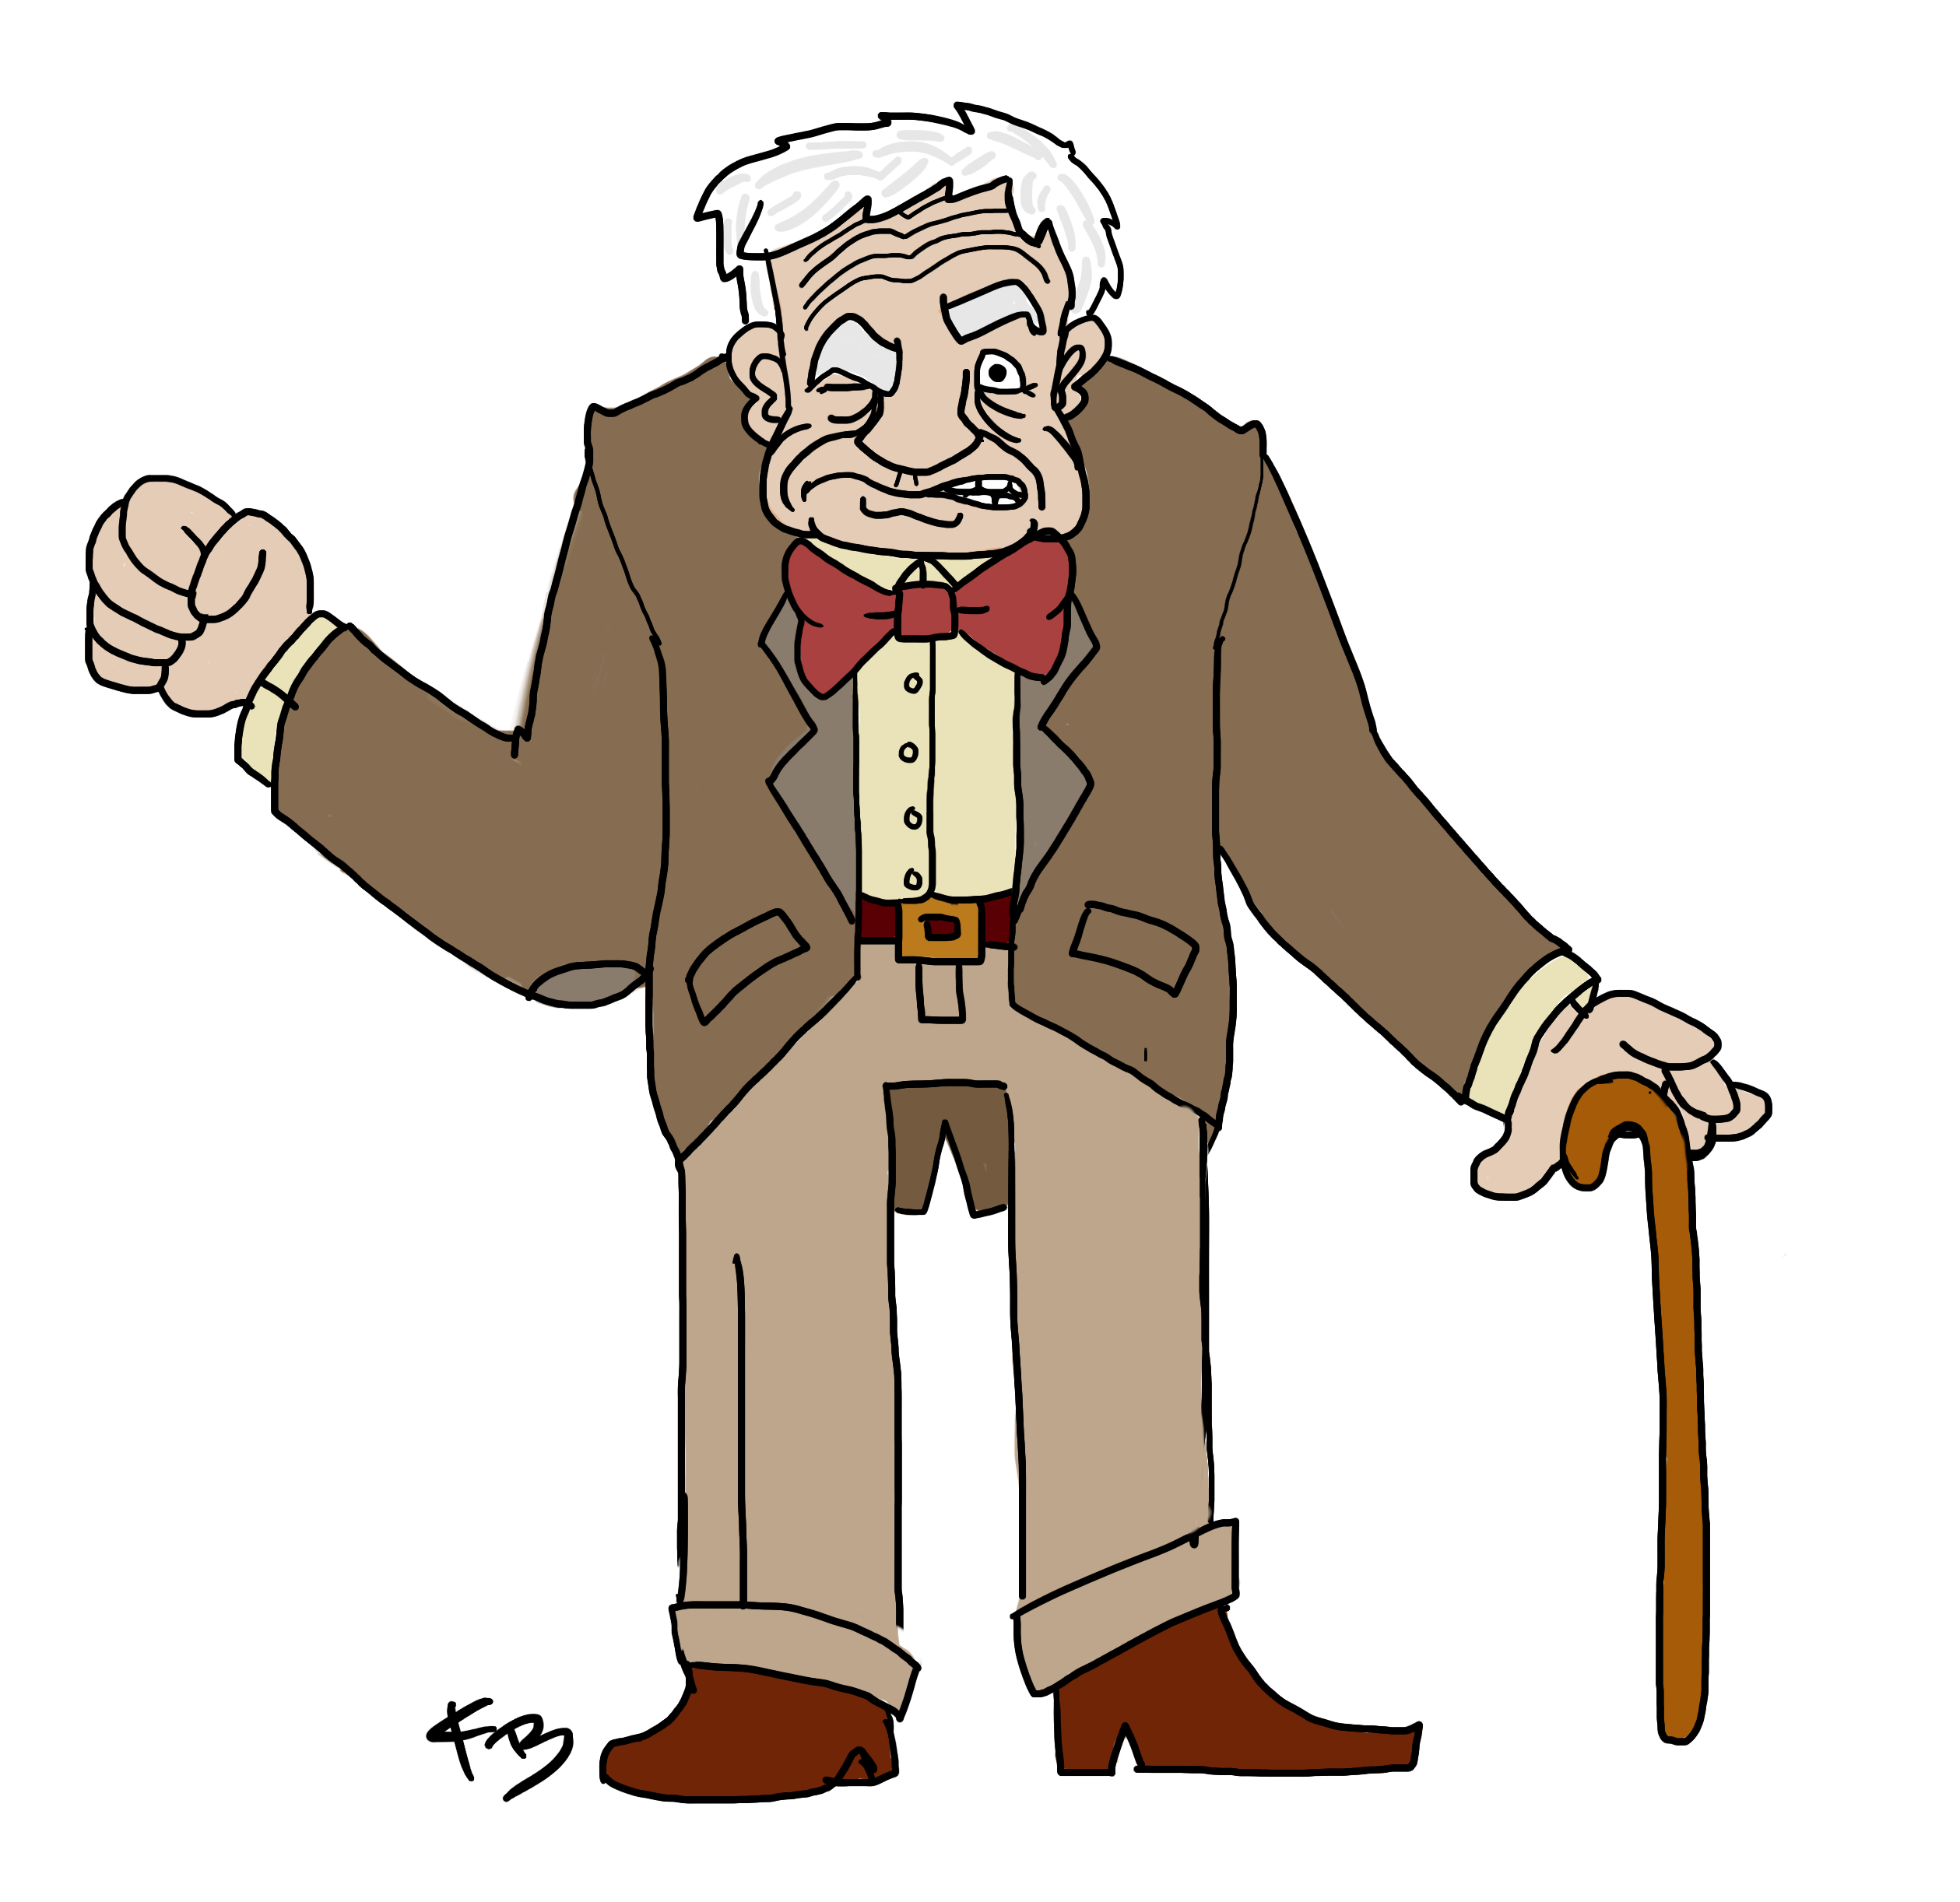 Grumpy old man clipart pluspng - Grumpy Old Man PNG